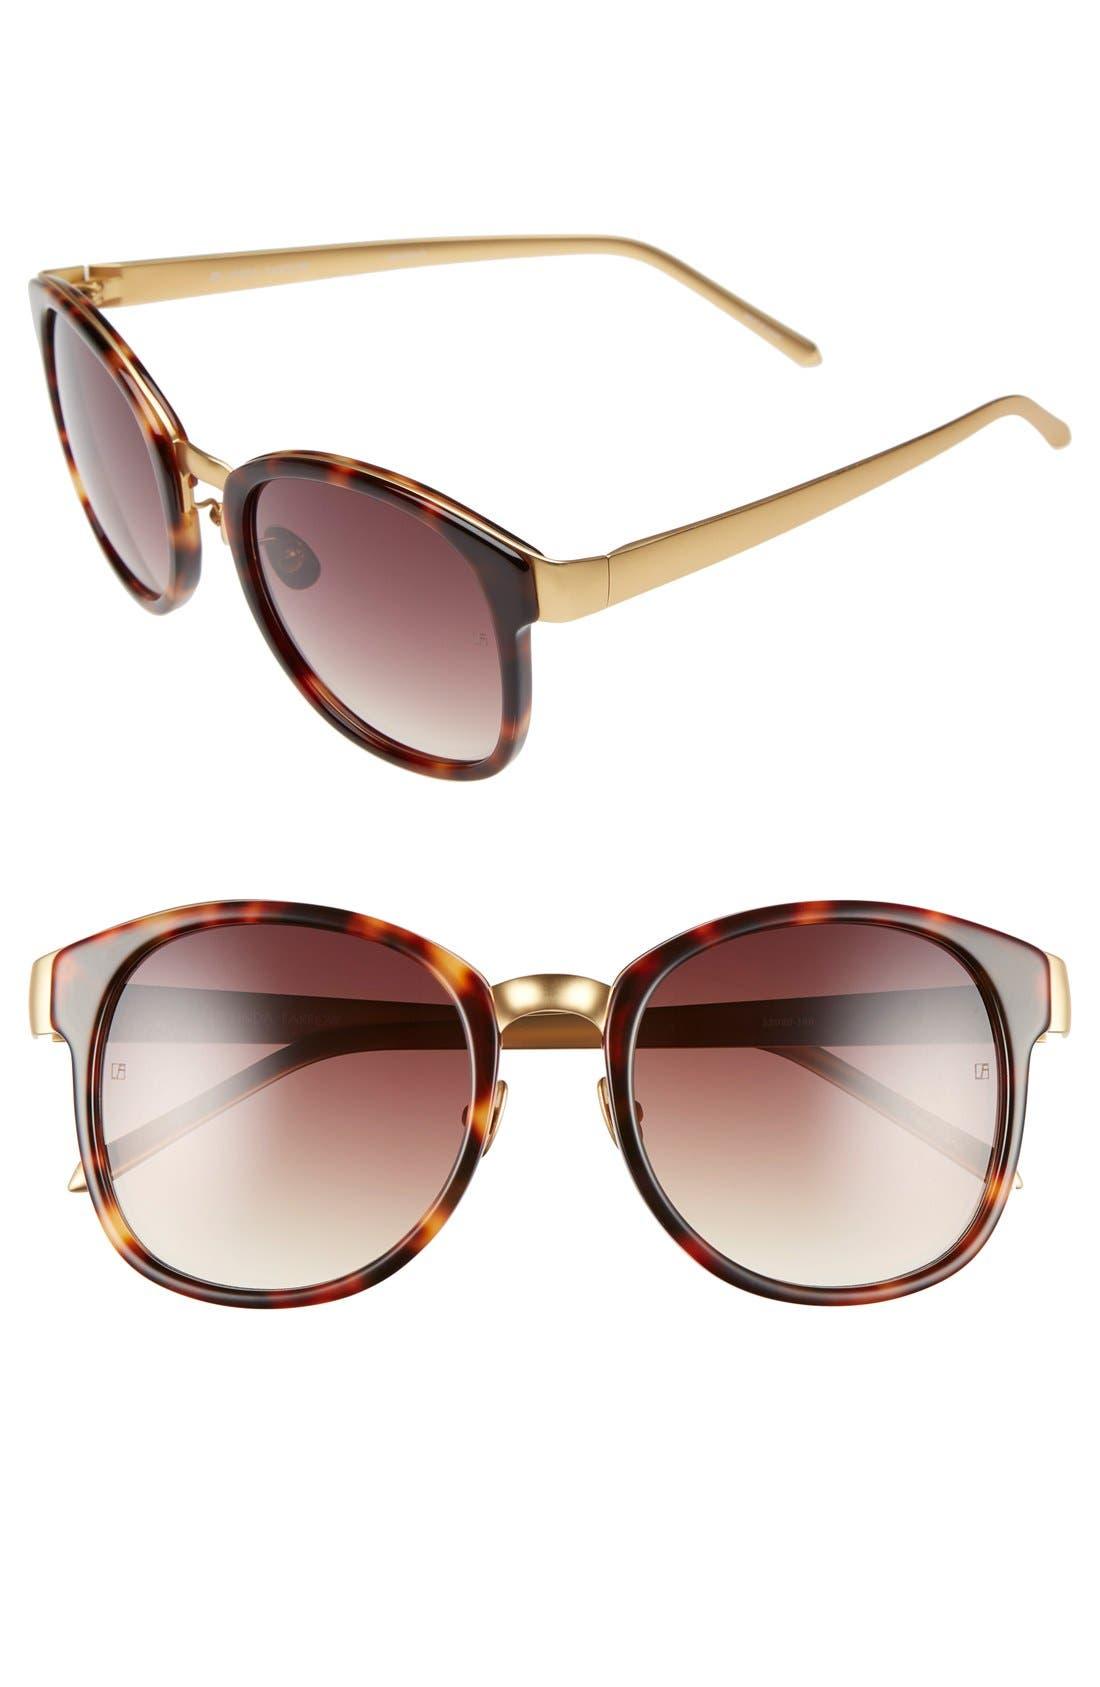 D-Frame 52mm 24 Karat Gold Trim Sunglasses,                             Main thumbnail 1, color,                             Tortoise/ Brown Grad